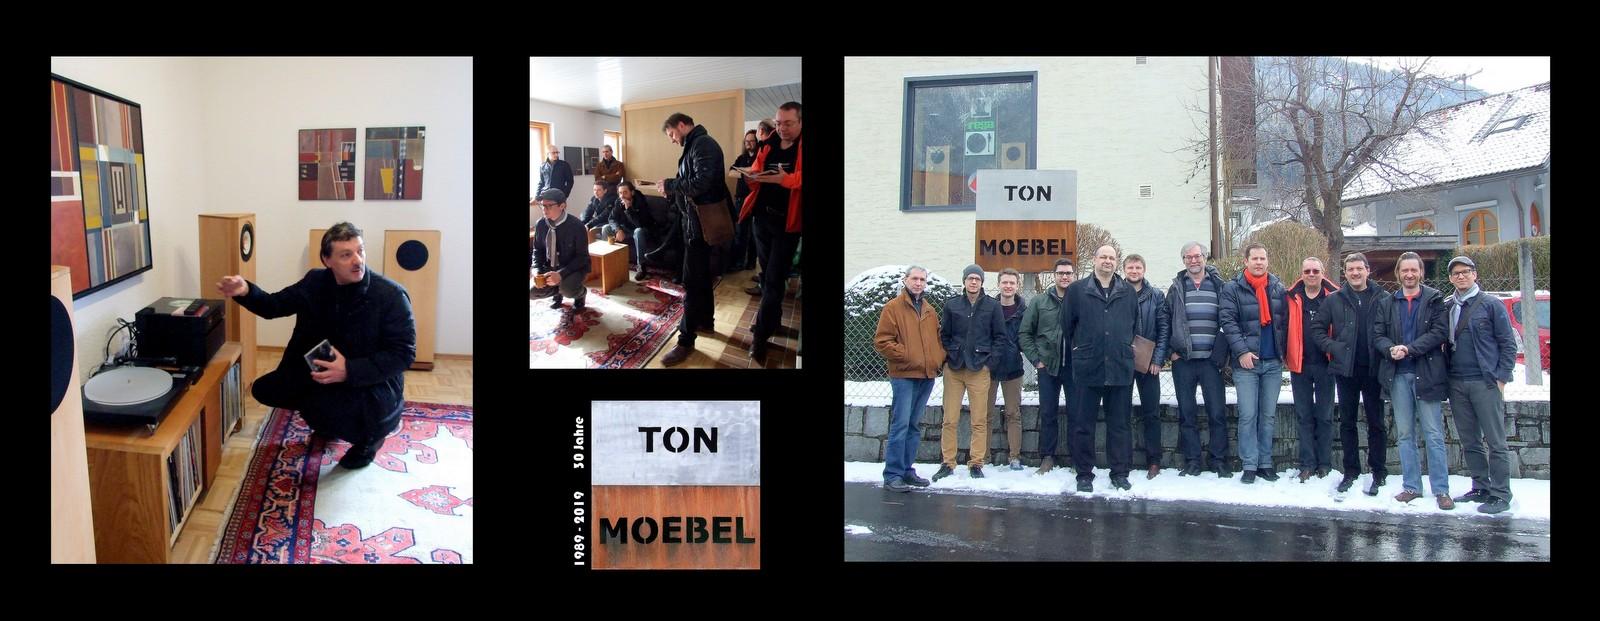 Internationale Jazzmusiker im TonMoebel Studio